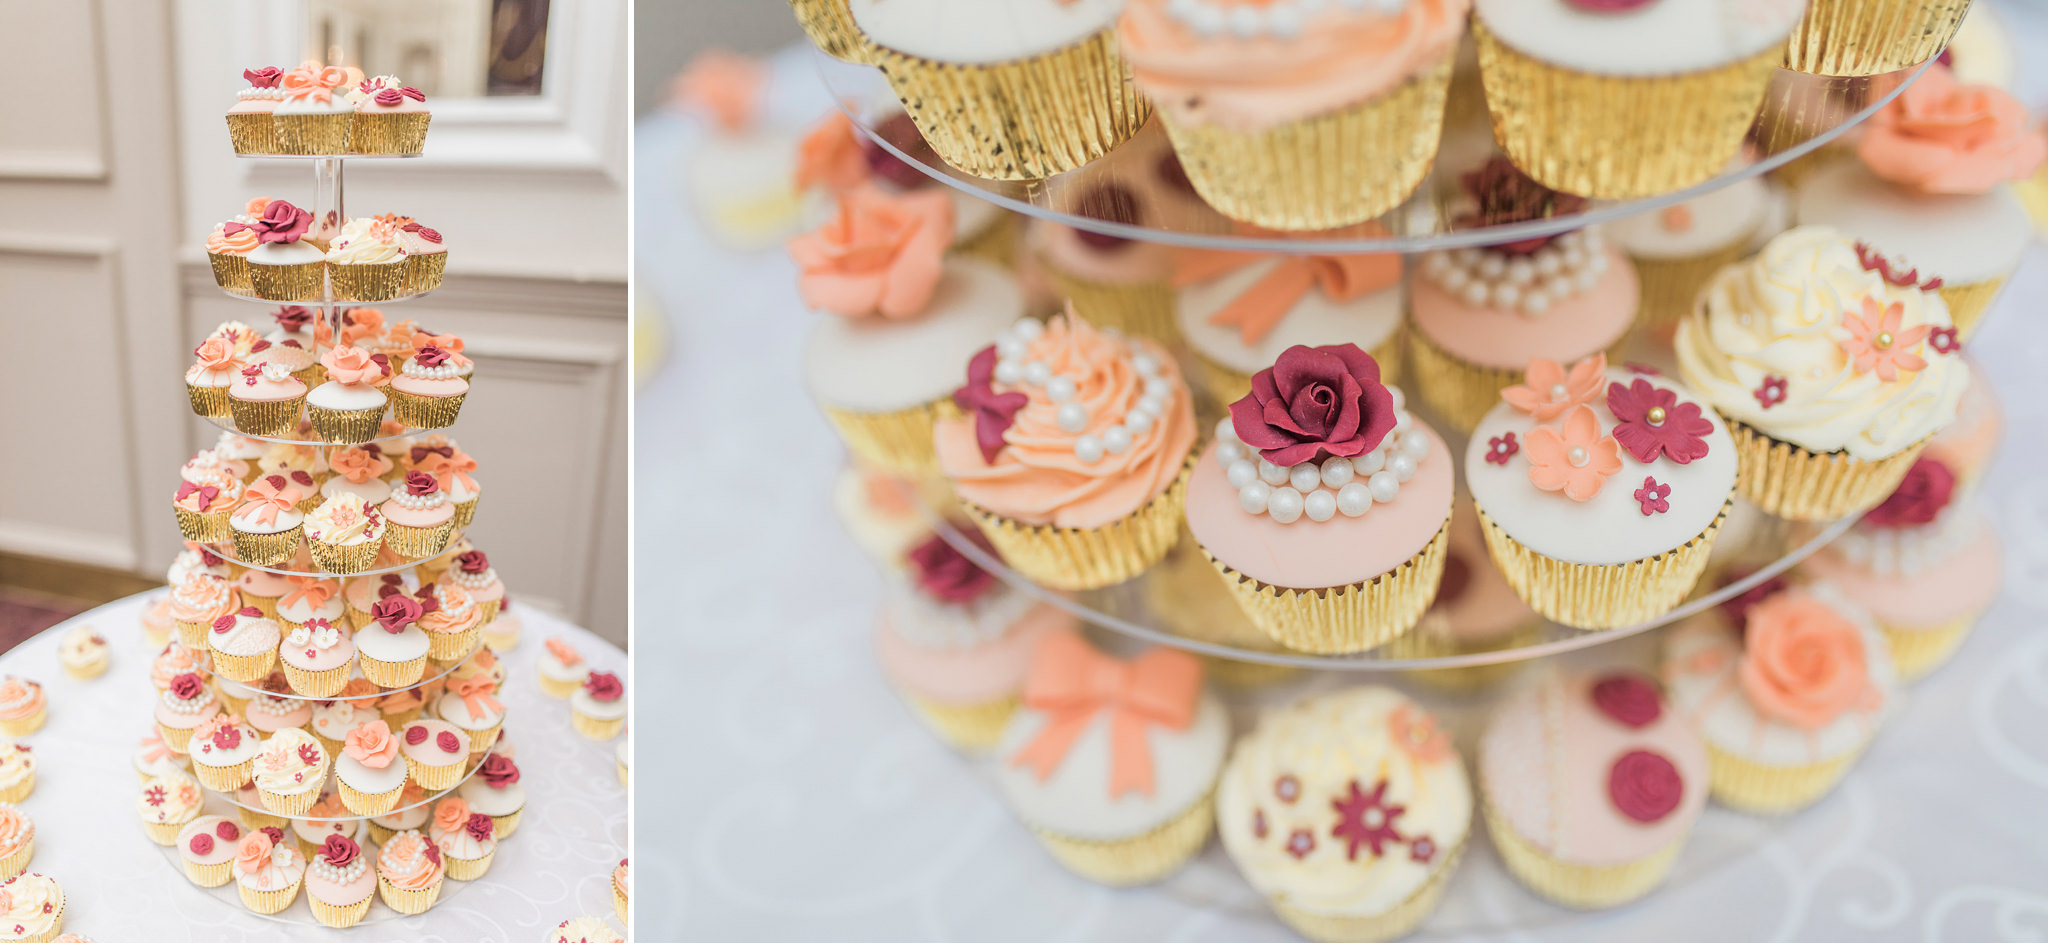 101-desination-wedding-photographer-scotland.jpg